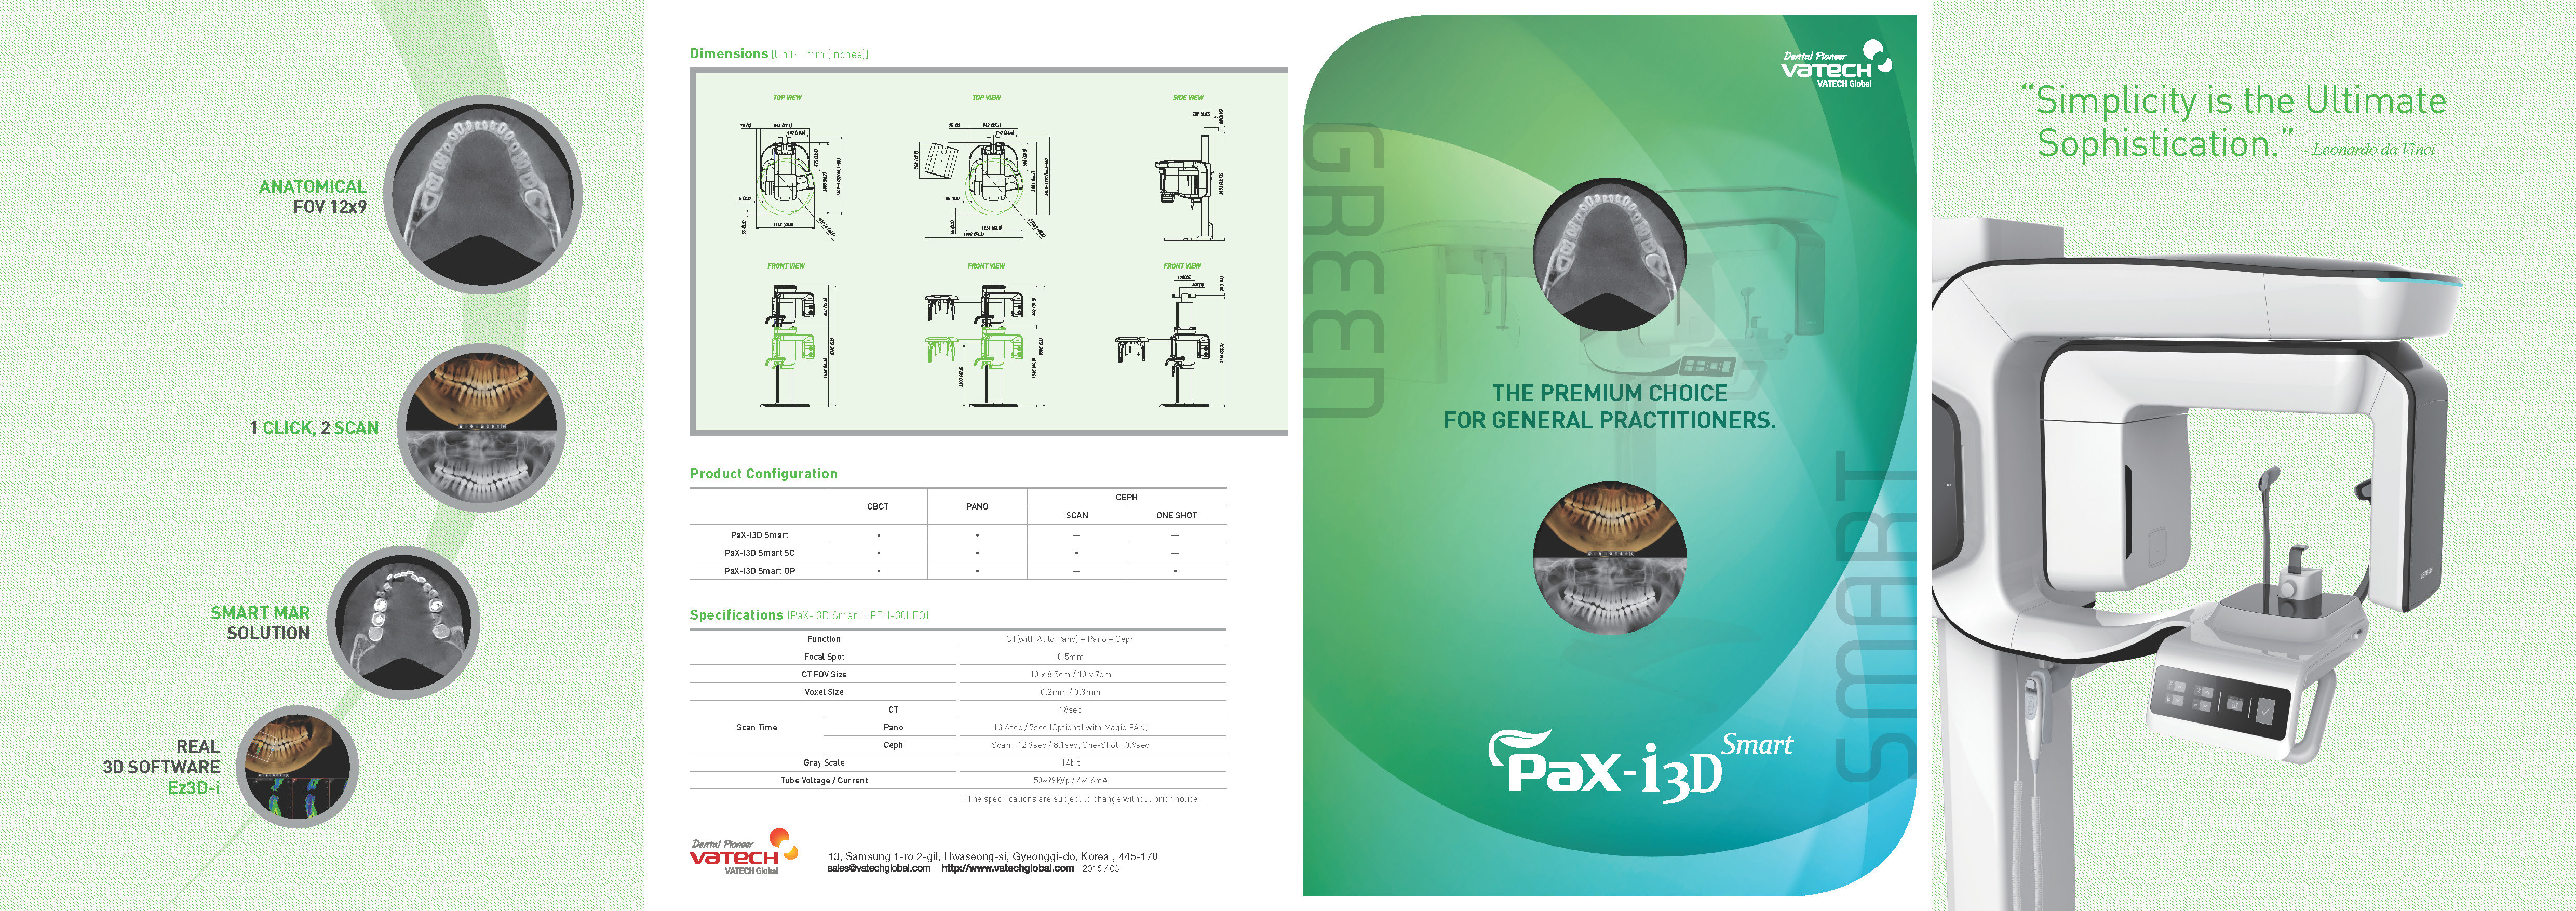 Dental Pax - I 3D Imaging Green